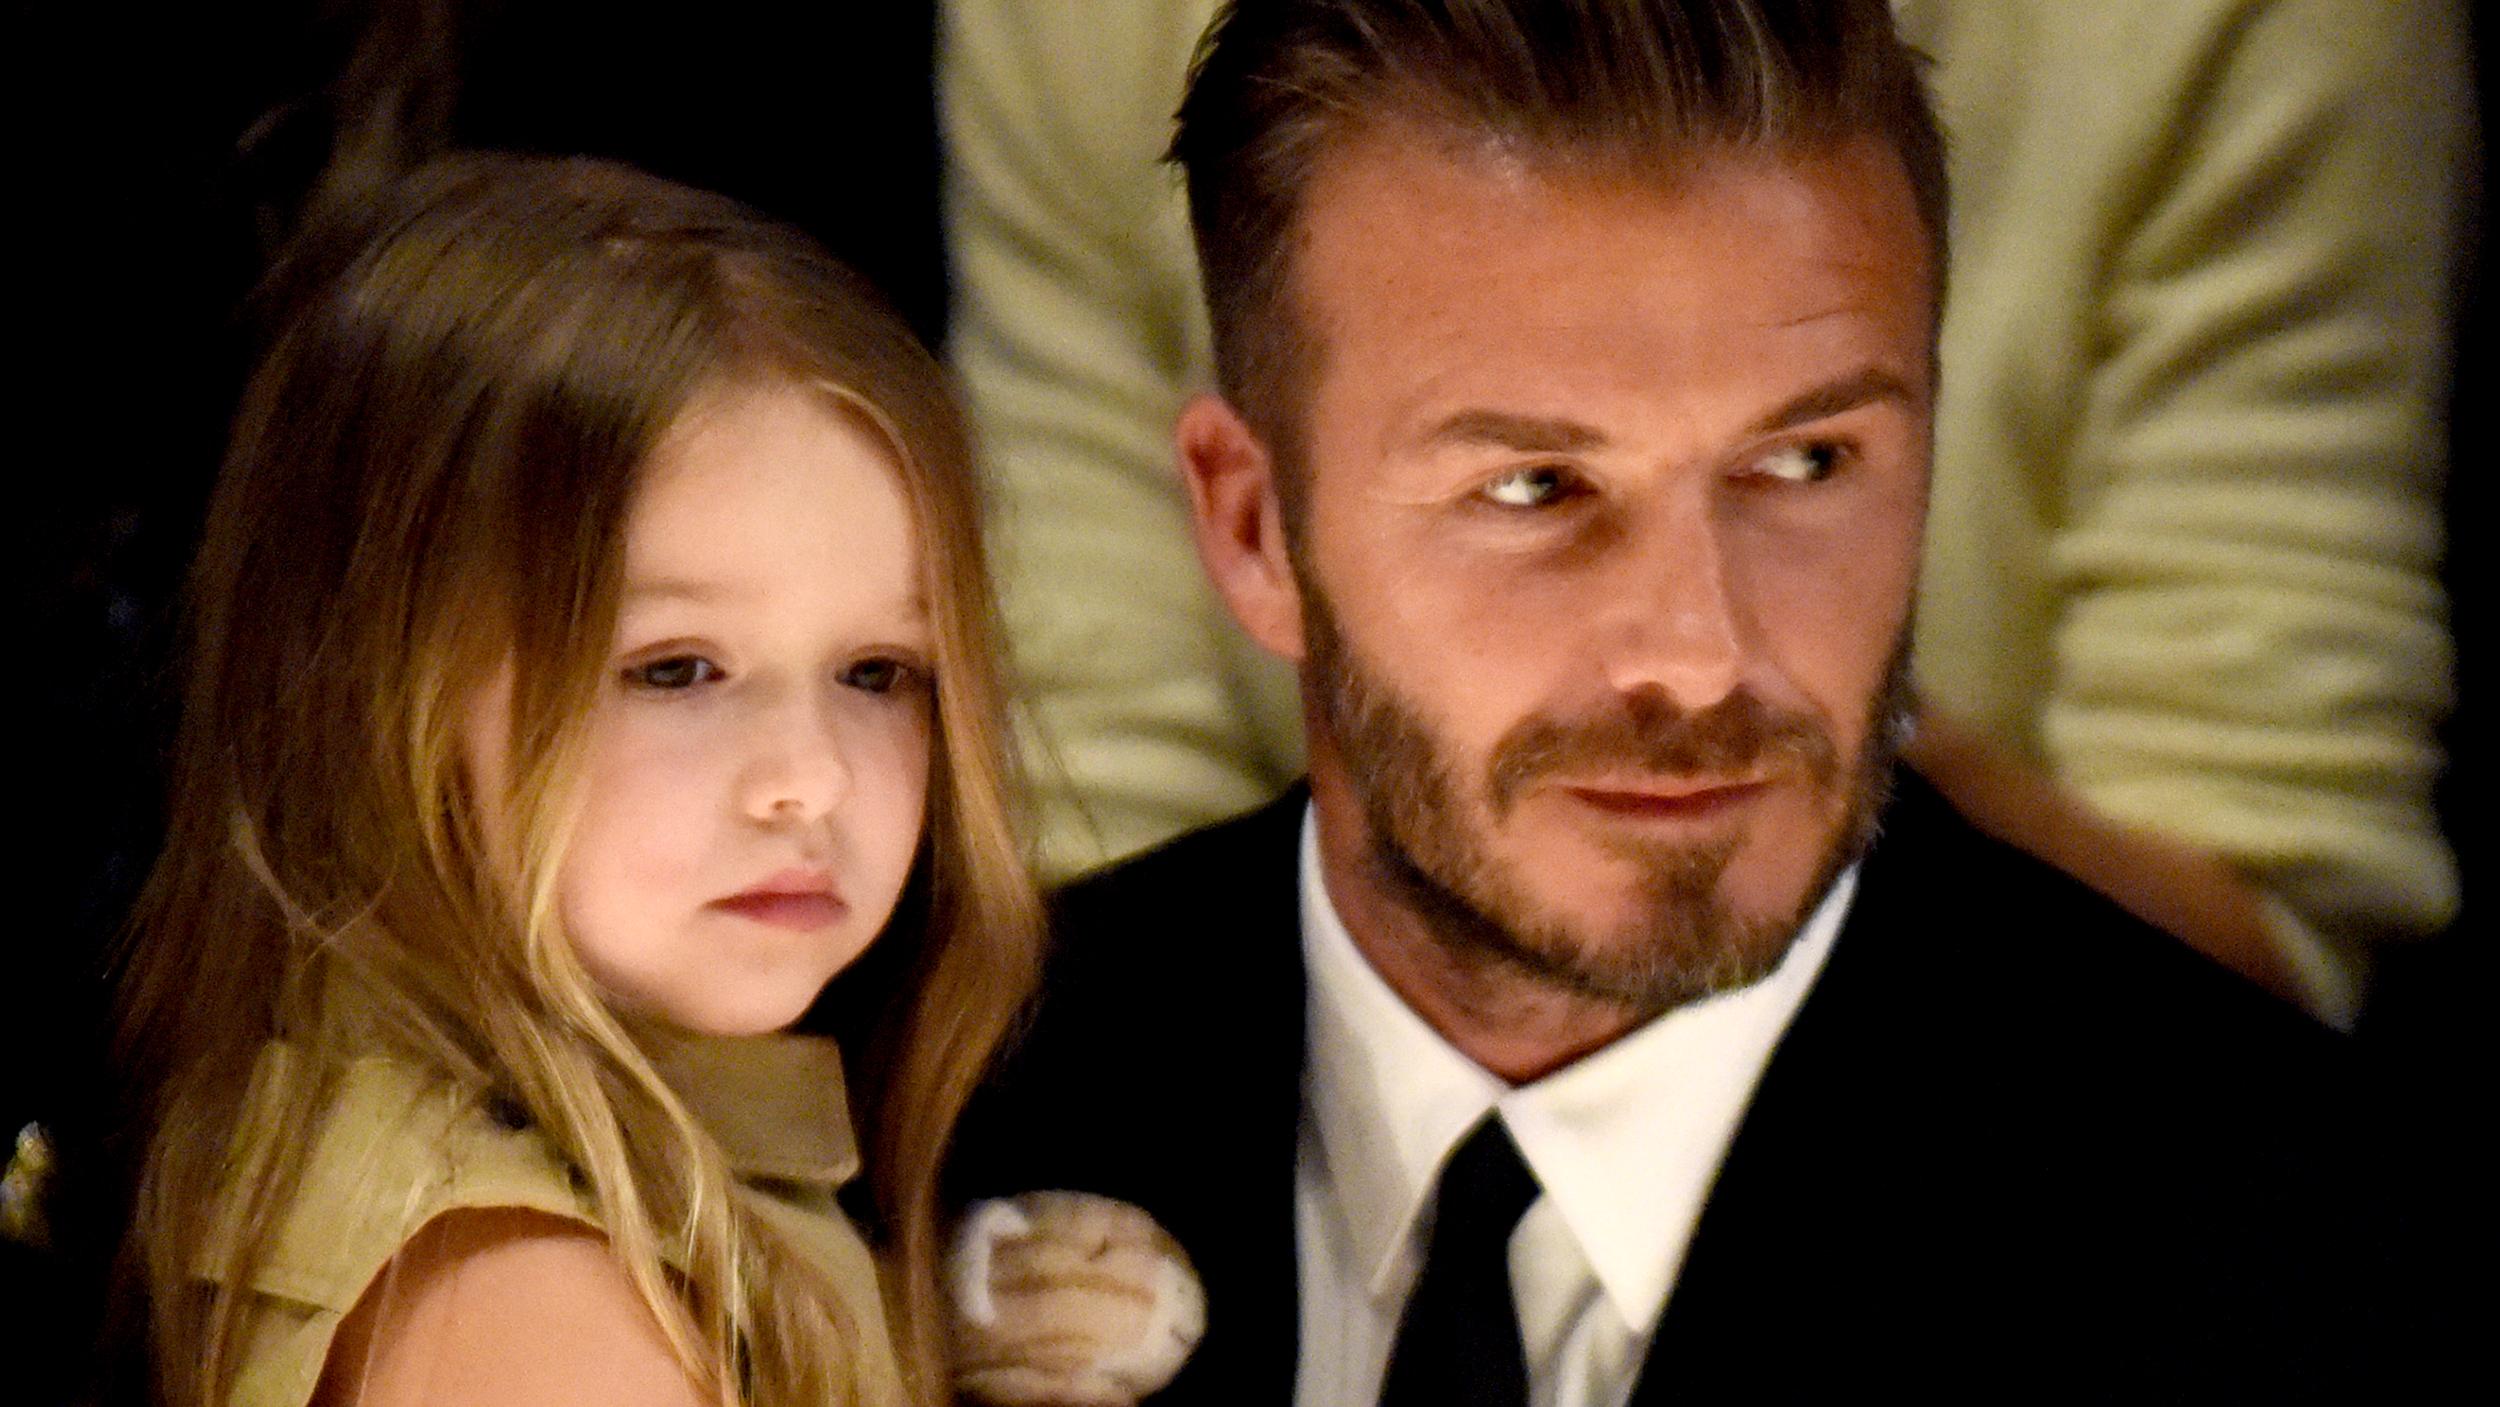 David Beckham Shows Off Sweet New Tattoo Designed By Daughter Harper